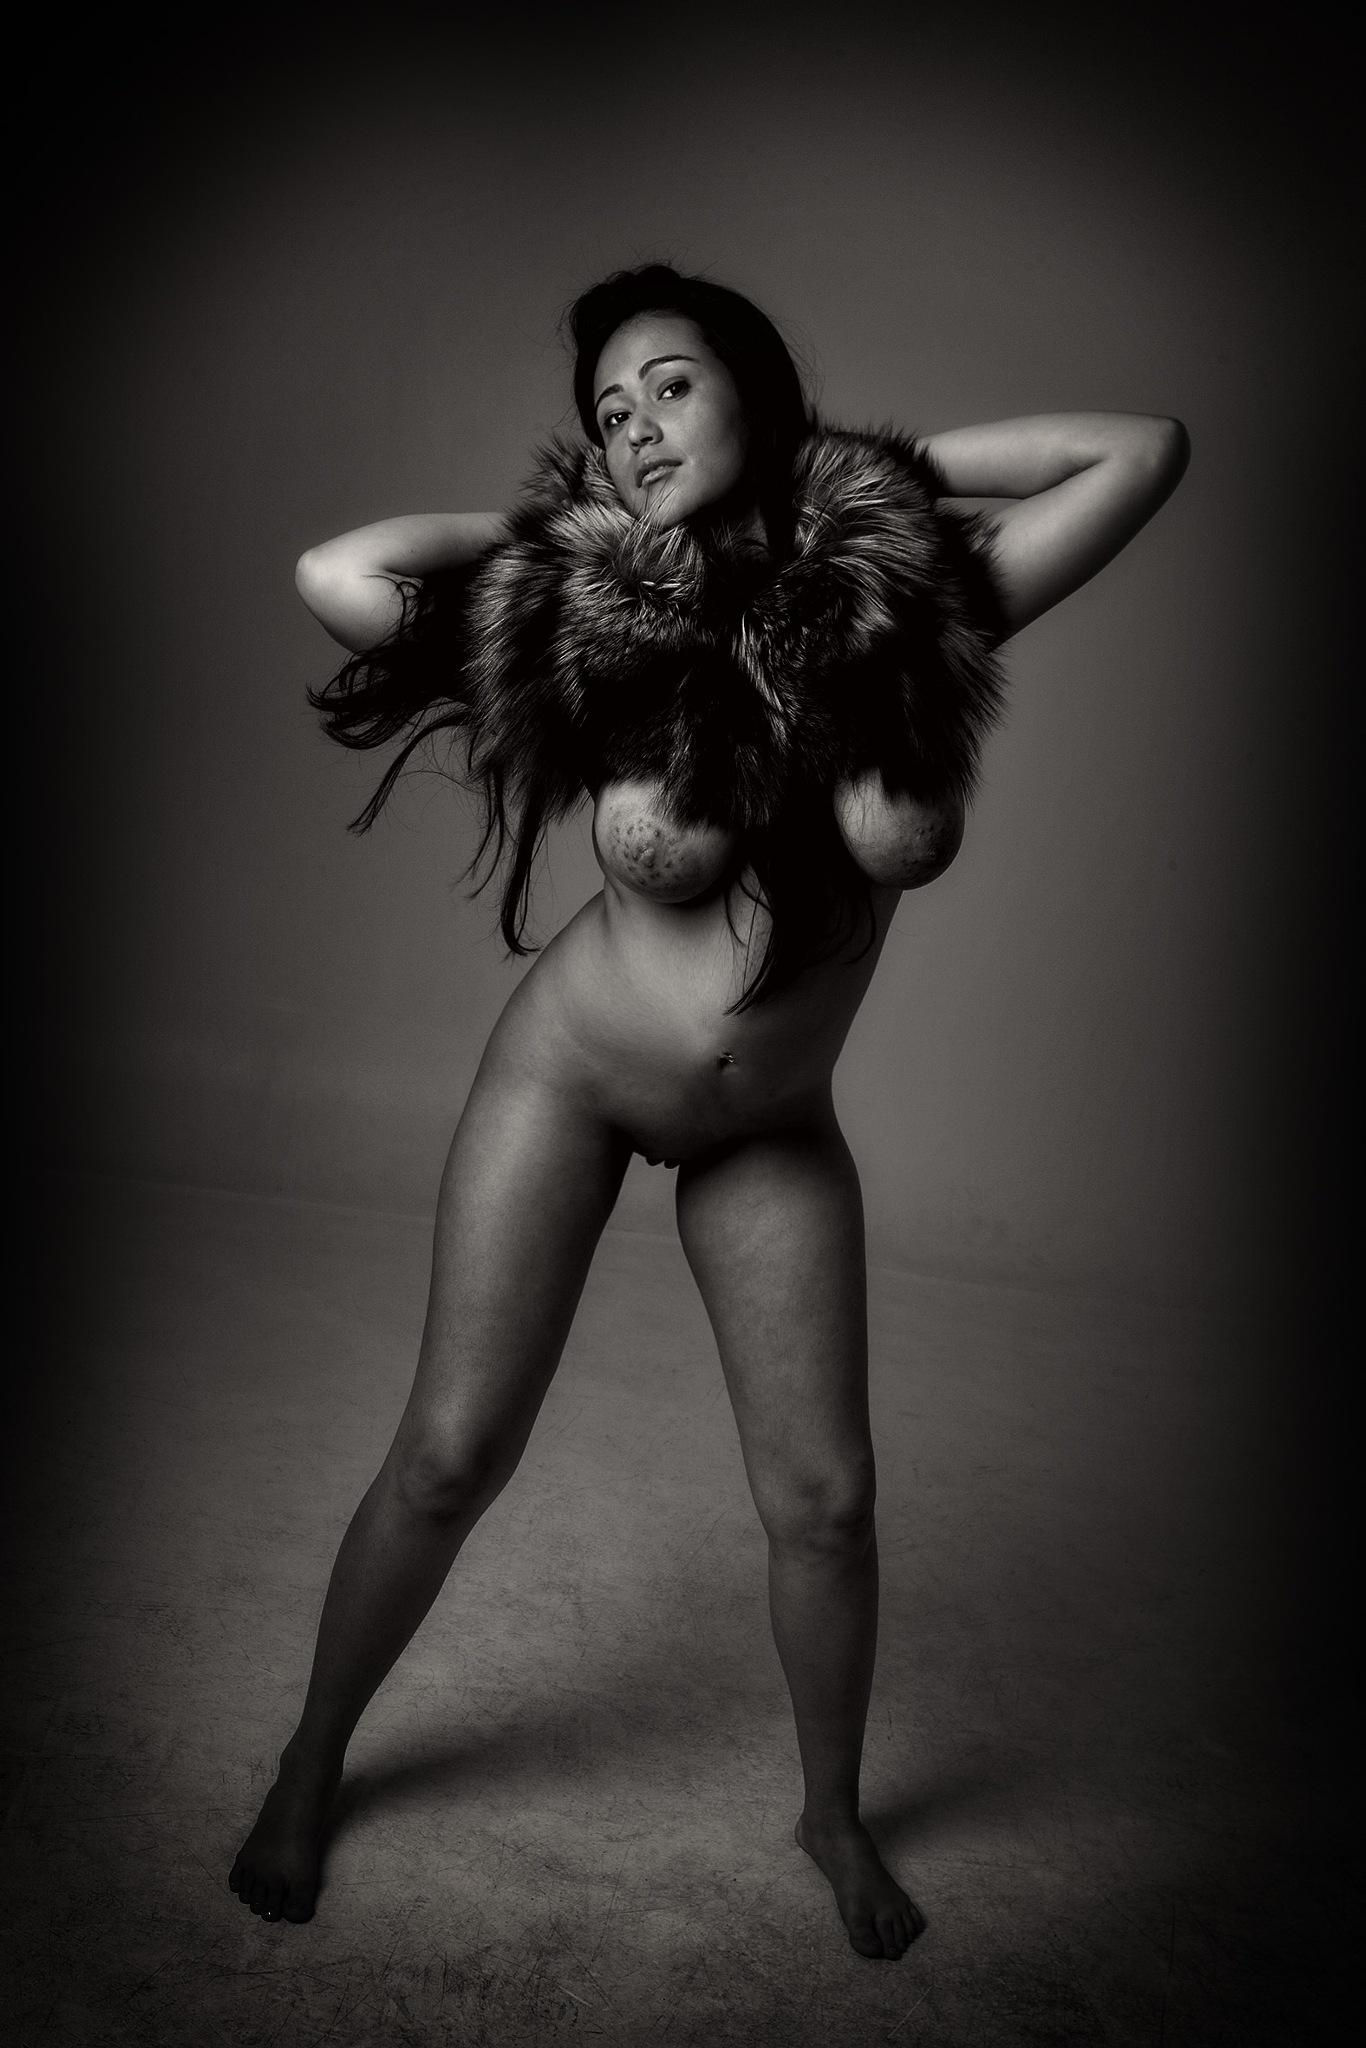 Nude in fur by Pixforce